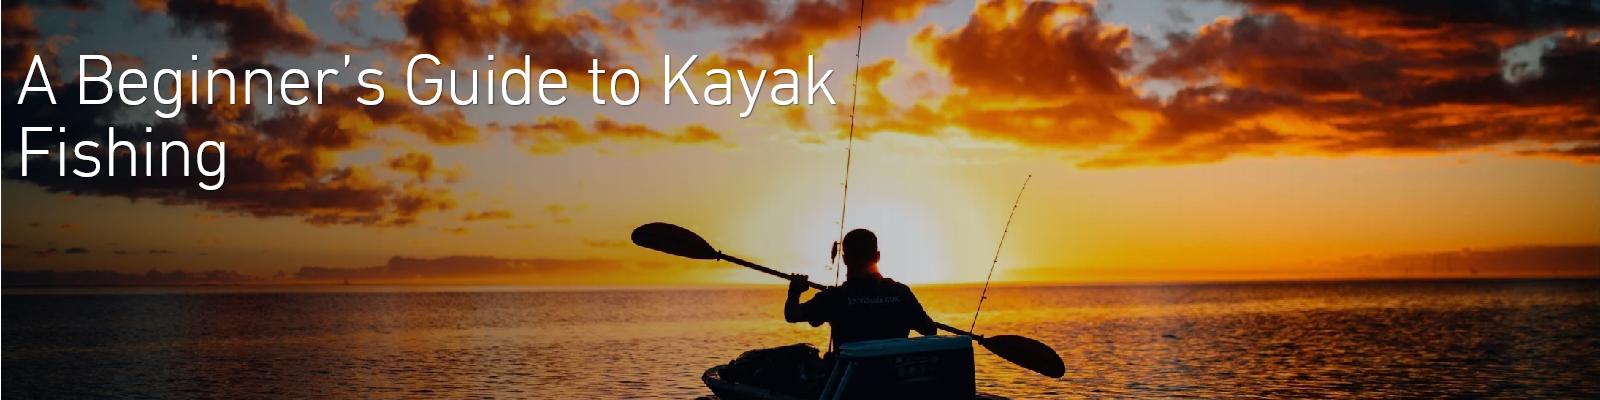 Screenshot 2021 07 23 at 12 30 23 A Beginners Guide to Kayak Fishing Lowrance UK